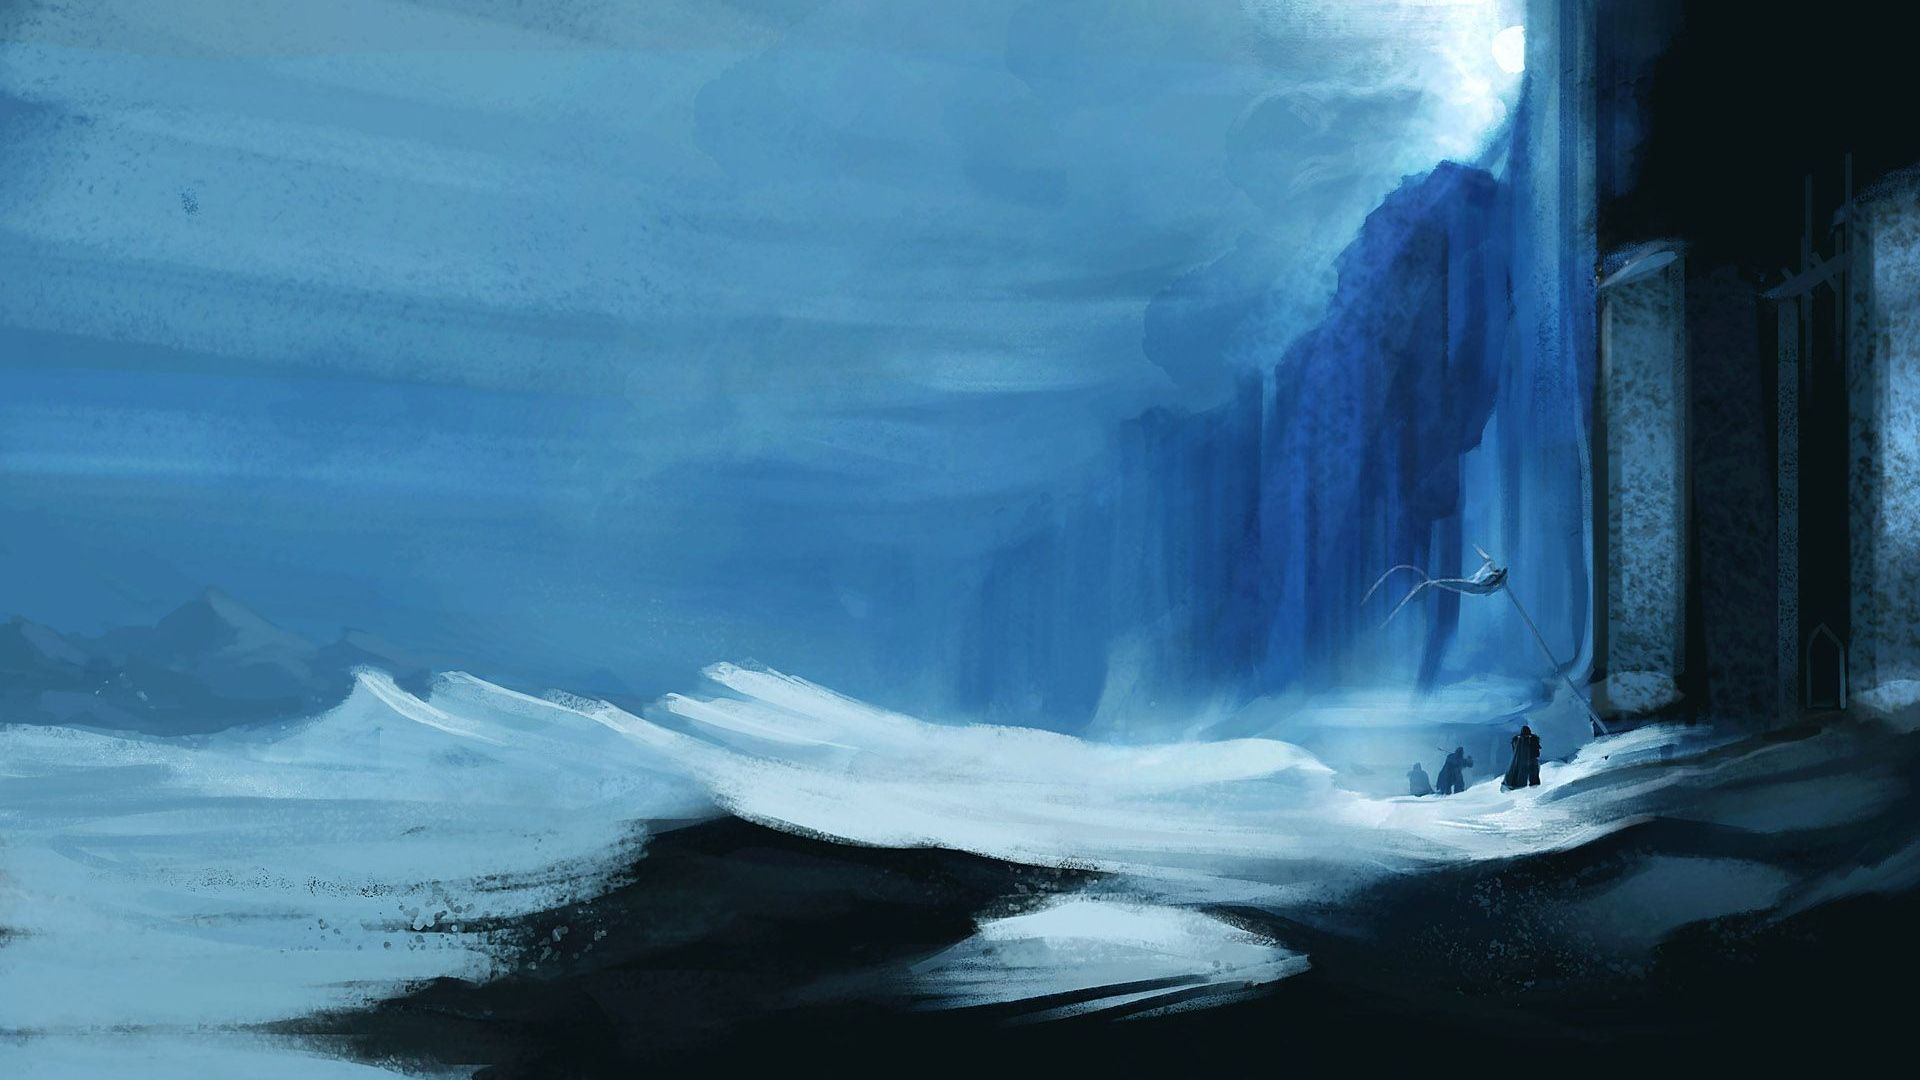 Game of Thrones blue wall fan art